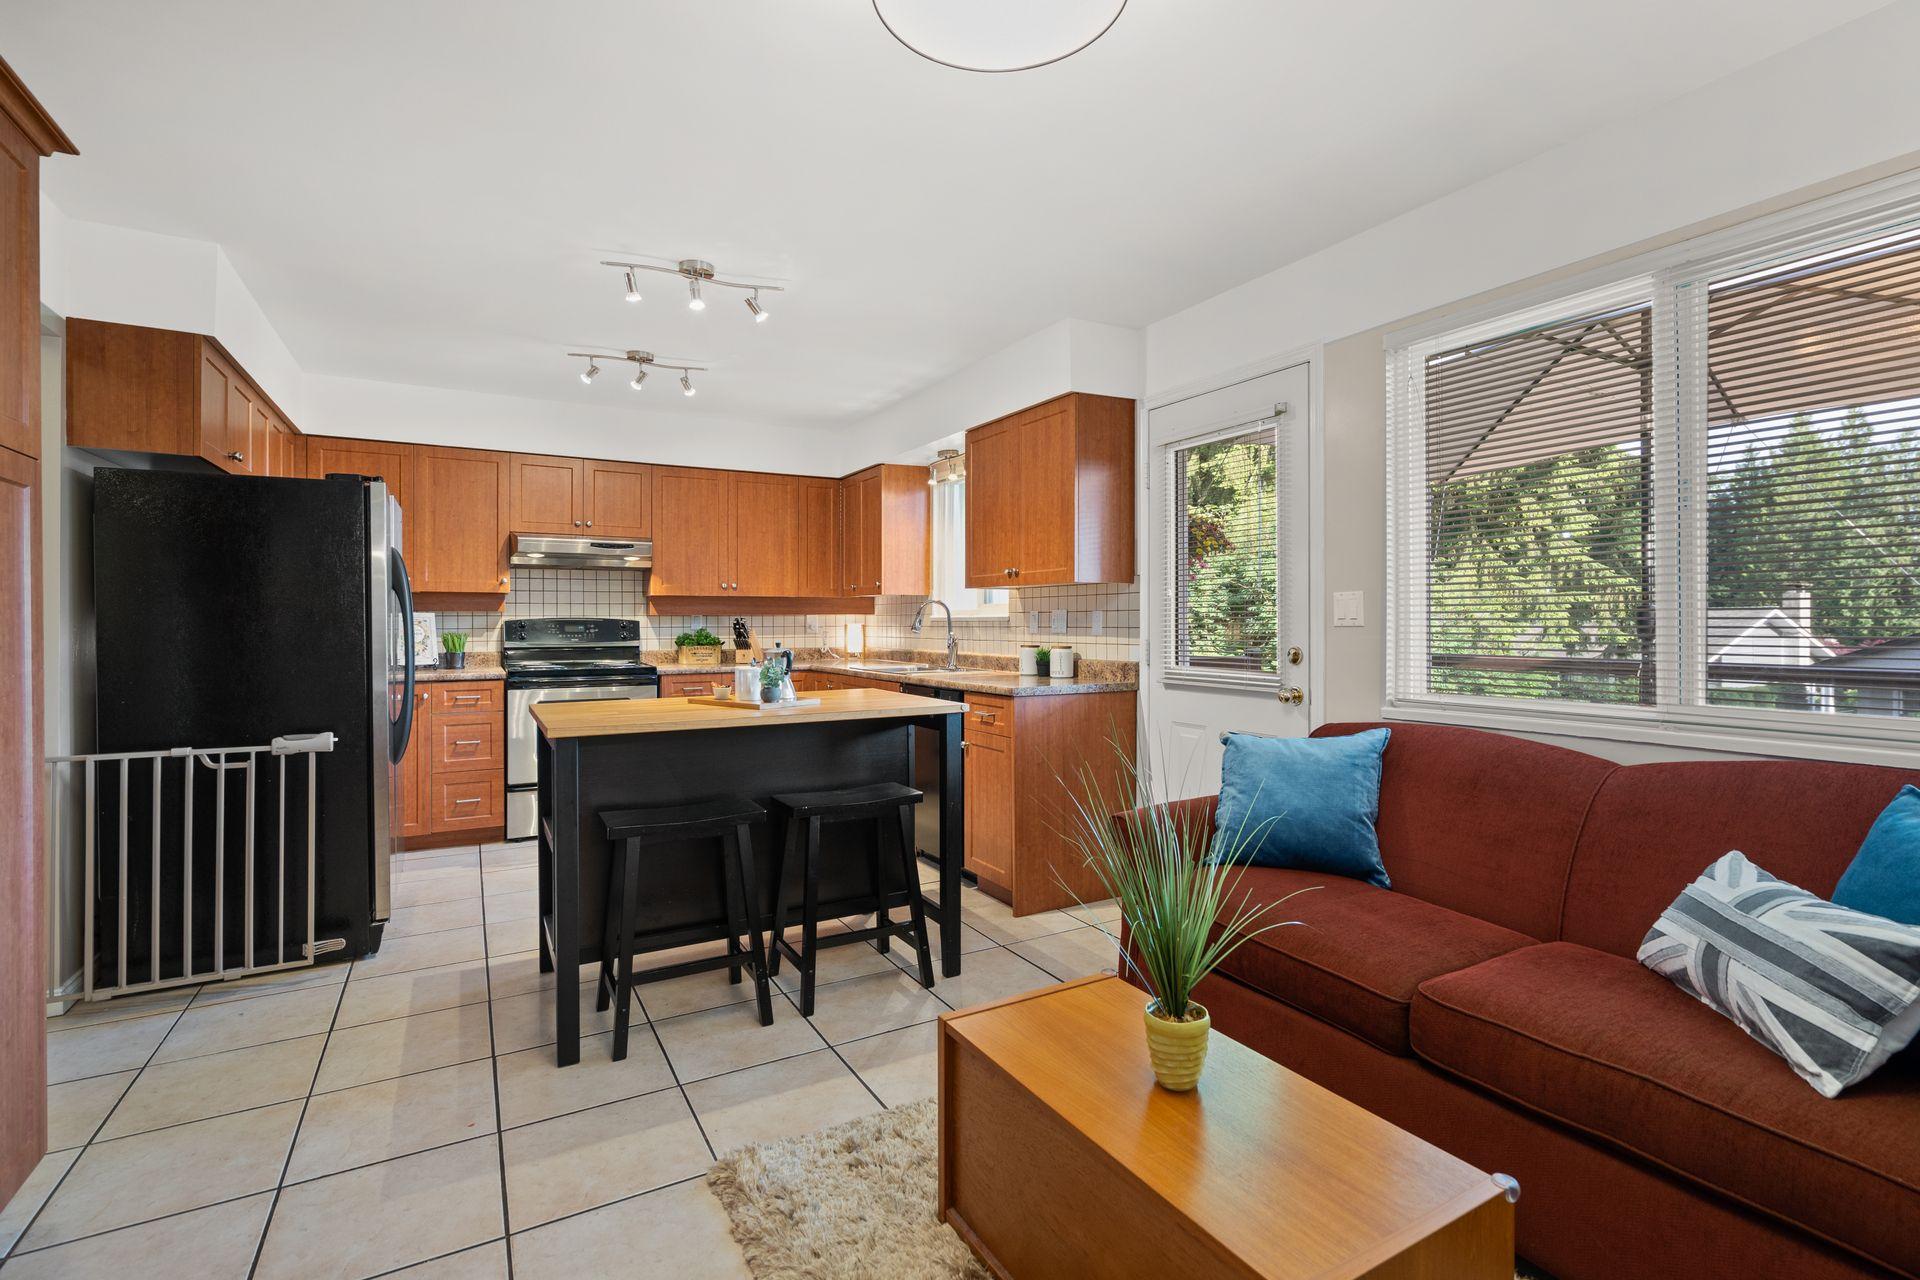 2673-byron-rd-north-vancouver-17 at 2673 Byron Road, Blueridge NV, North Vancouver